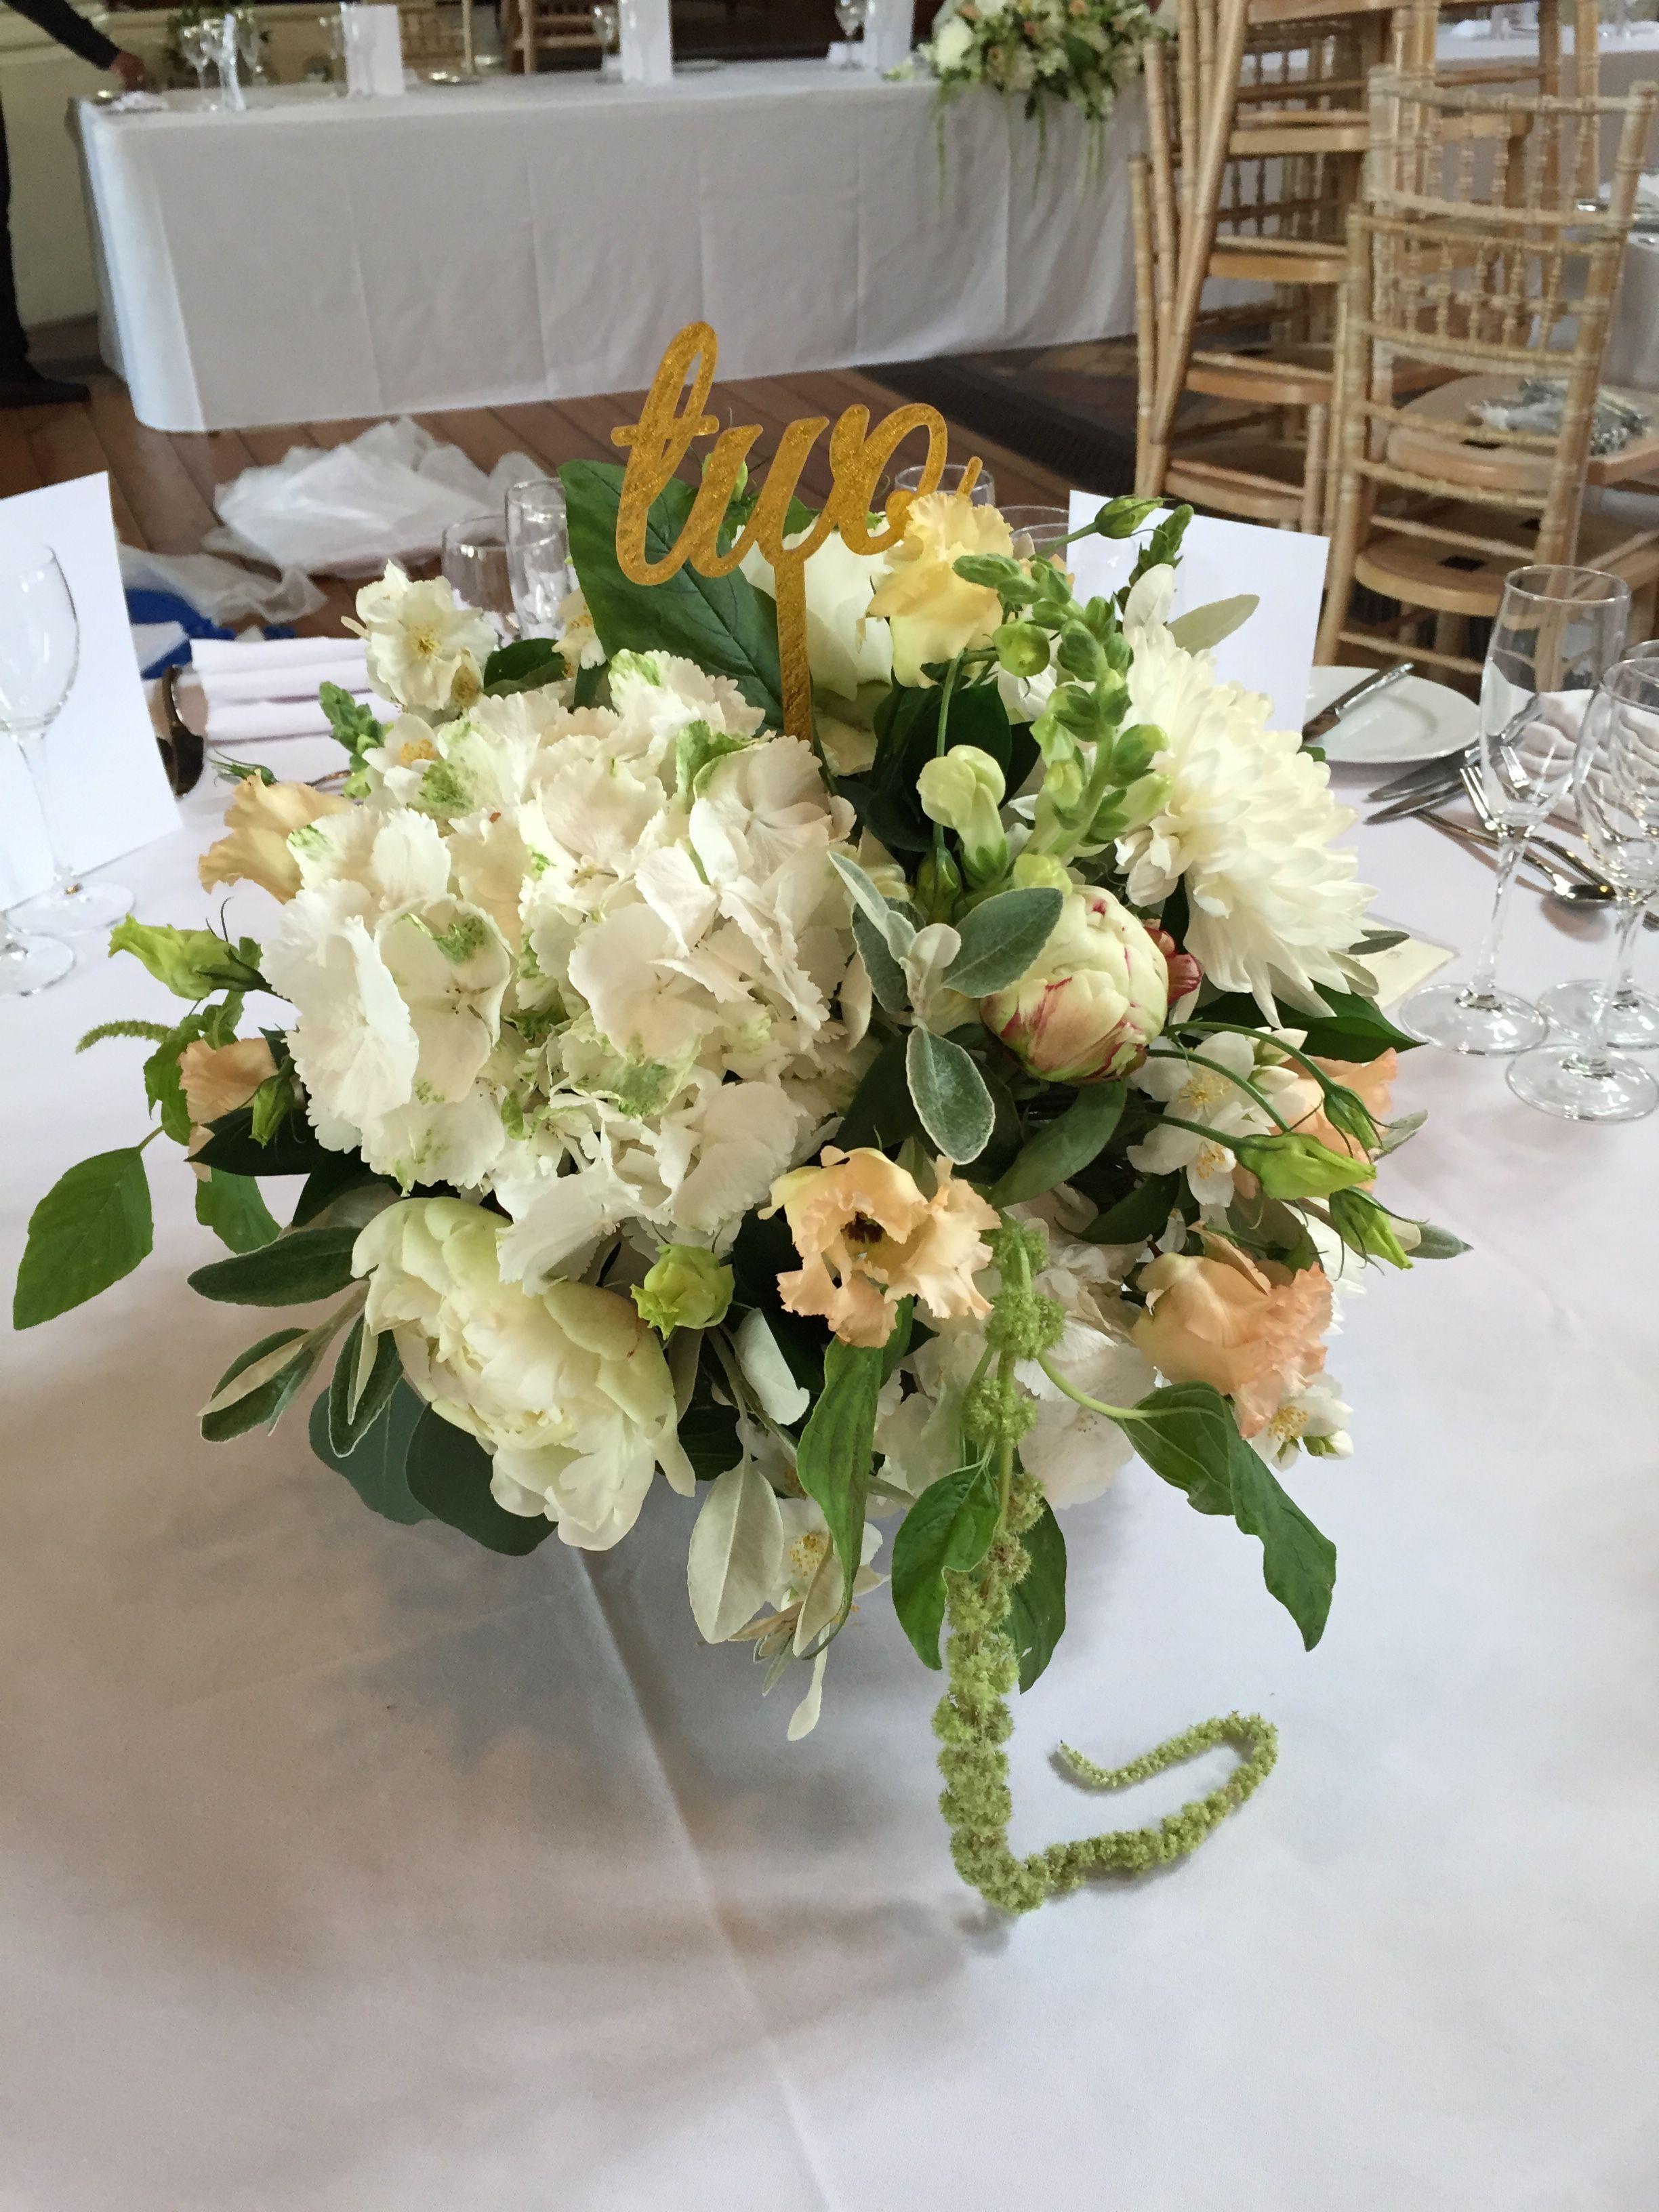 Ivory Nude And Peach Organic Style Wedding Centrepieces Hydrangea Amaranthus Lisianthus